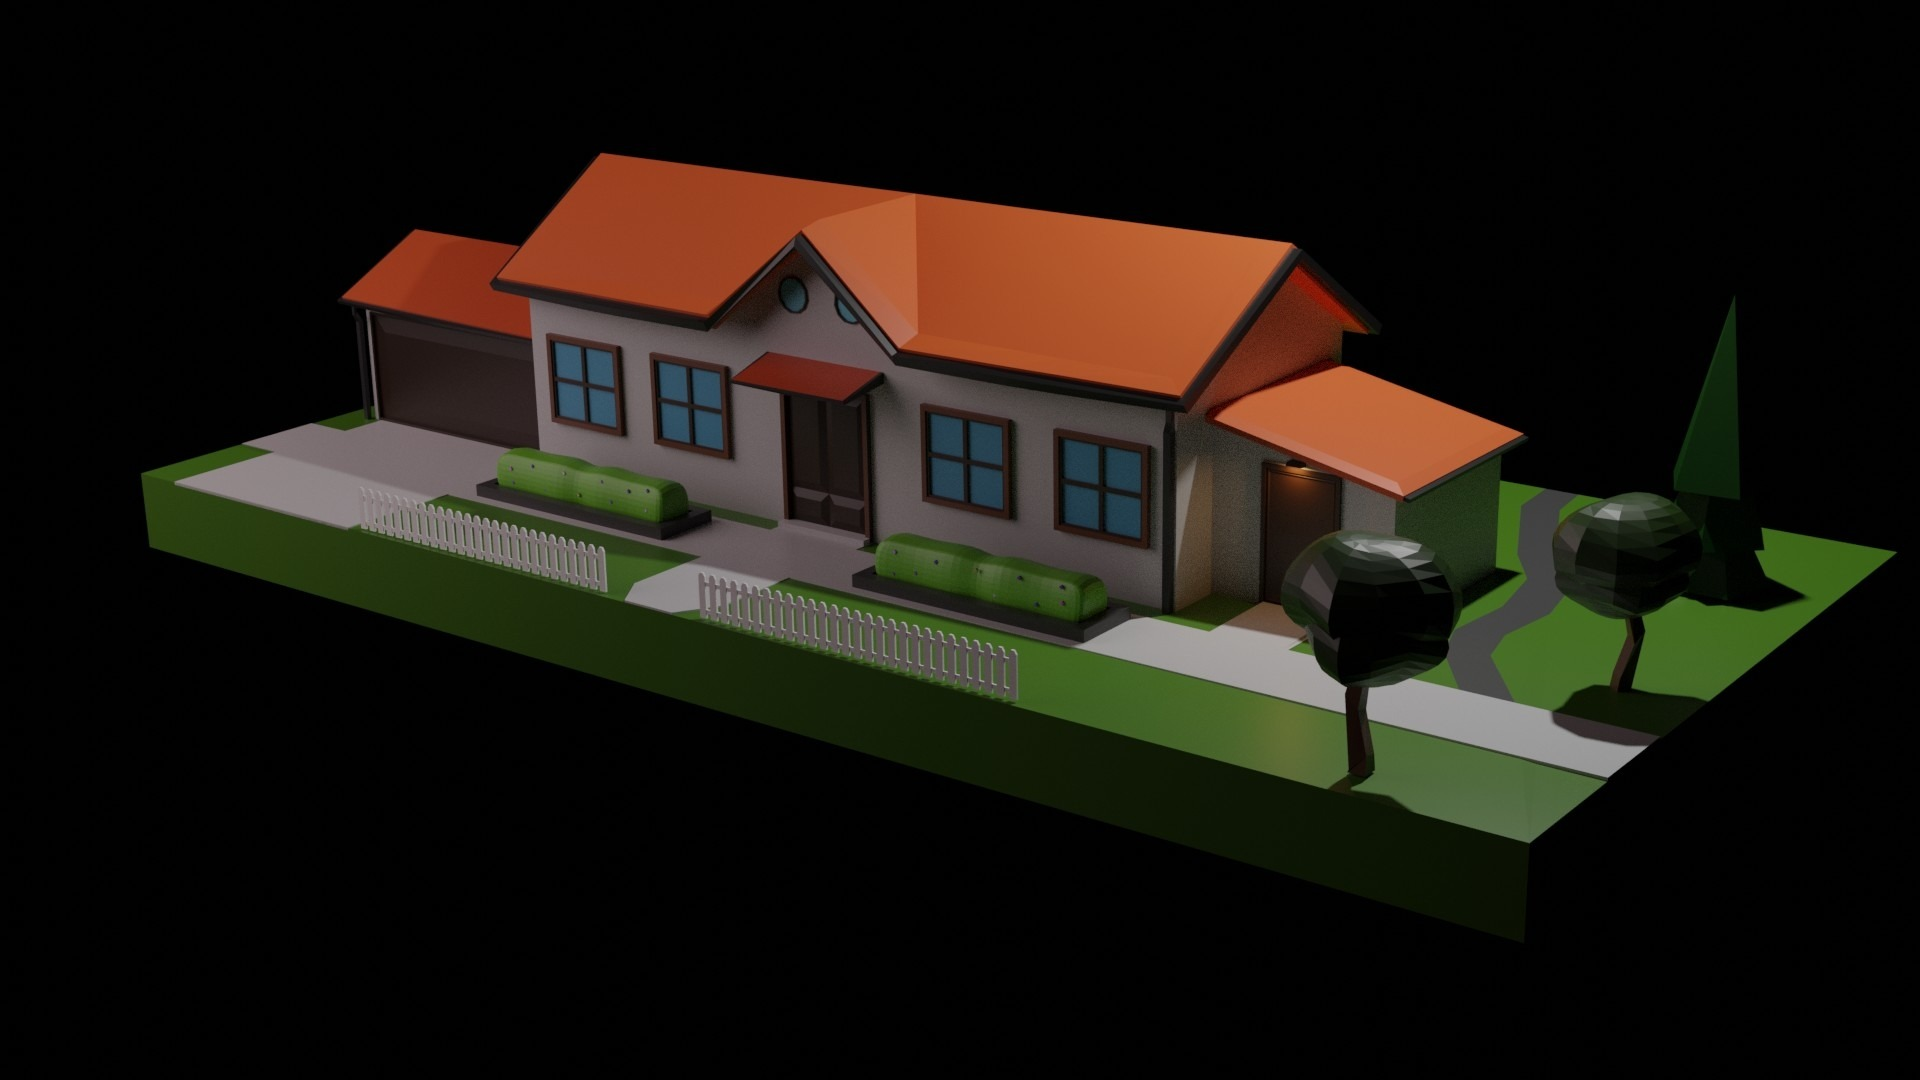 residential-cartoon-style-house